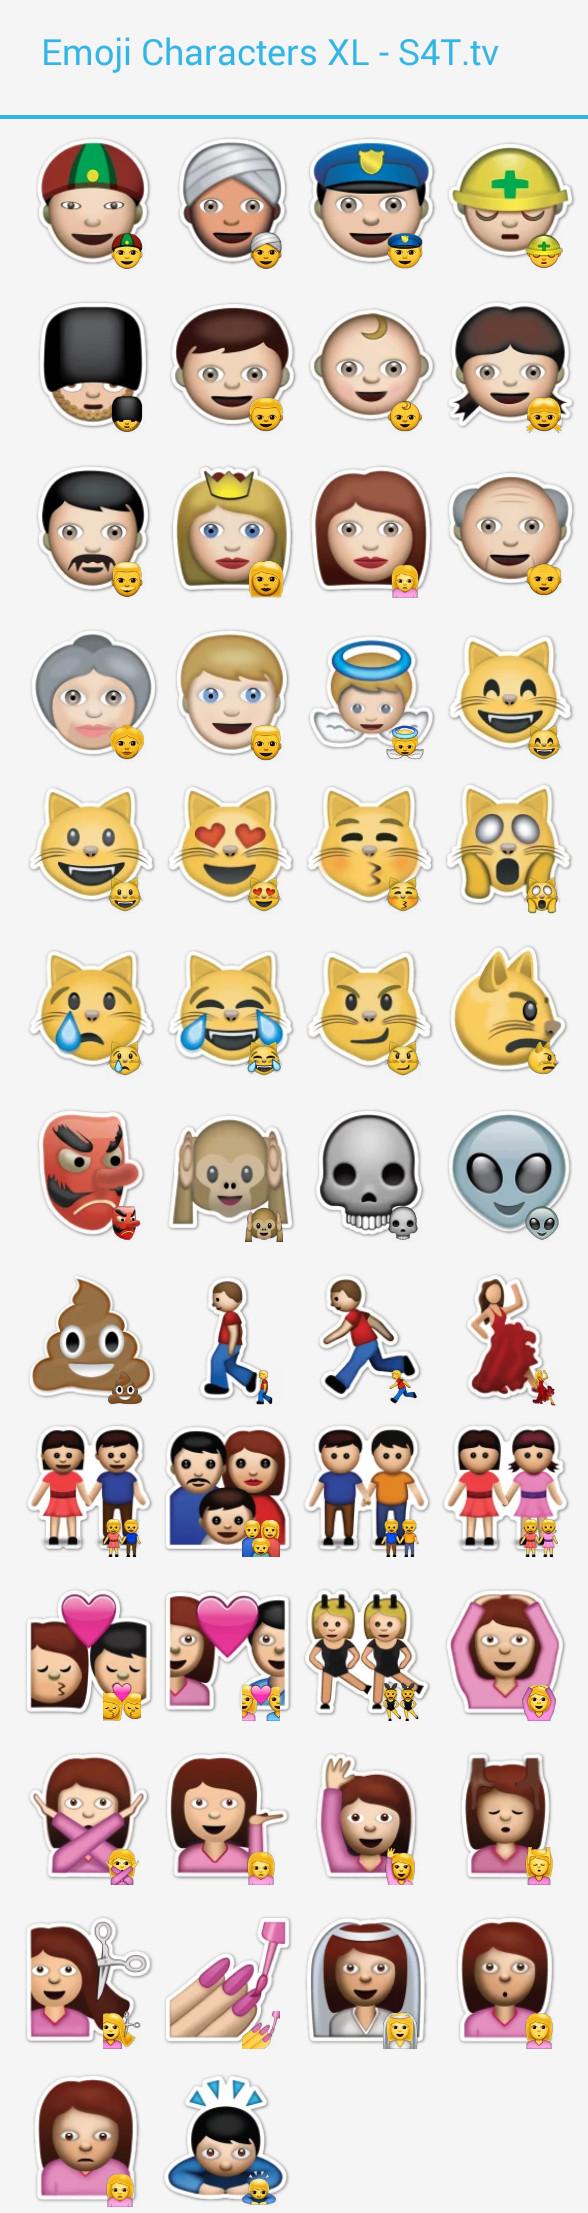 Characters Emoji XL